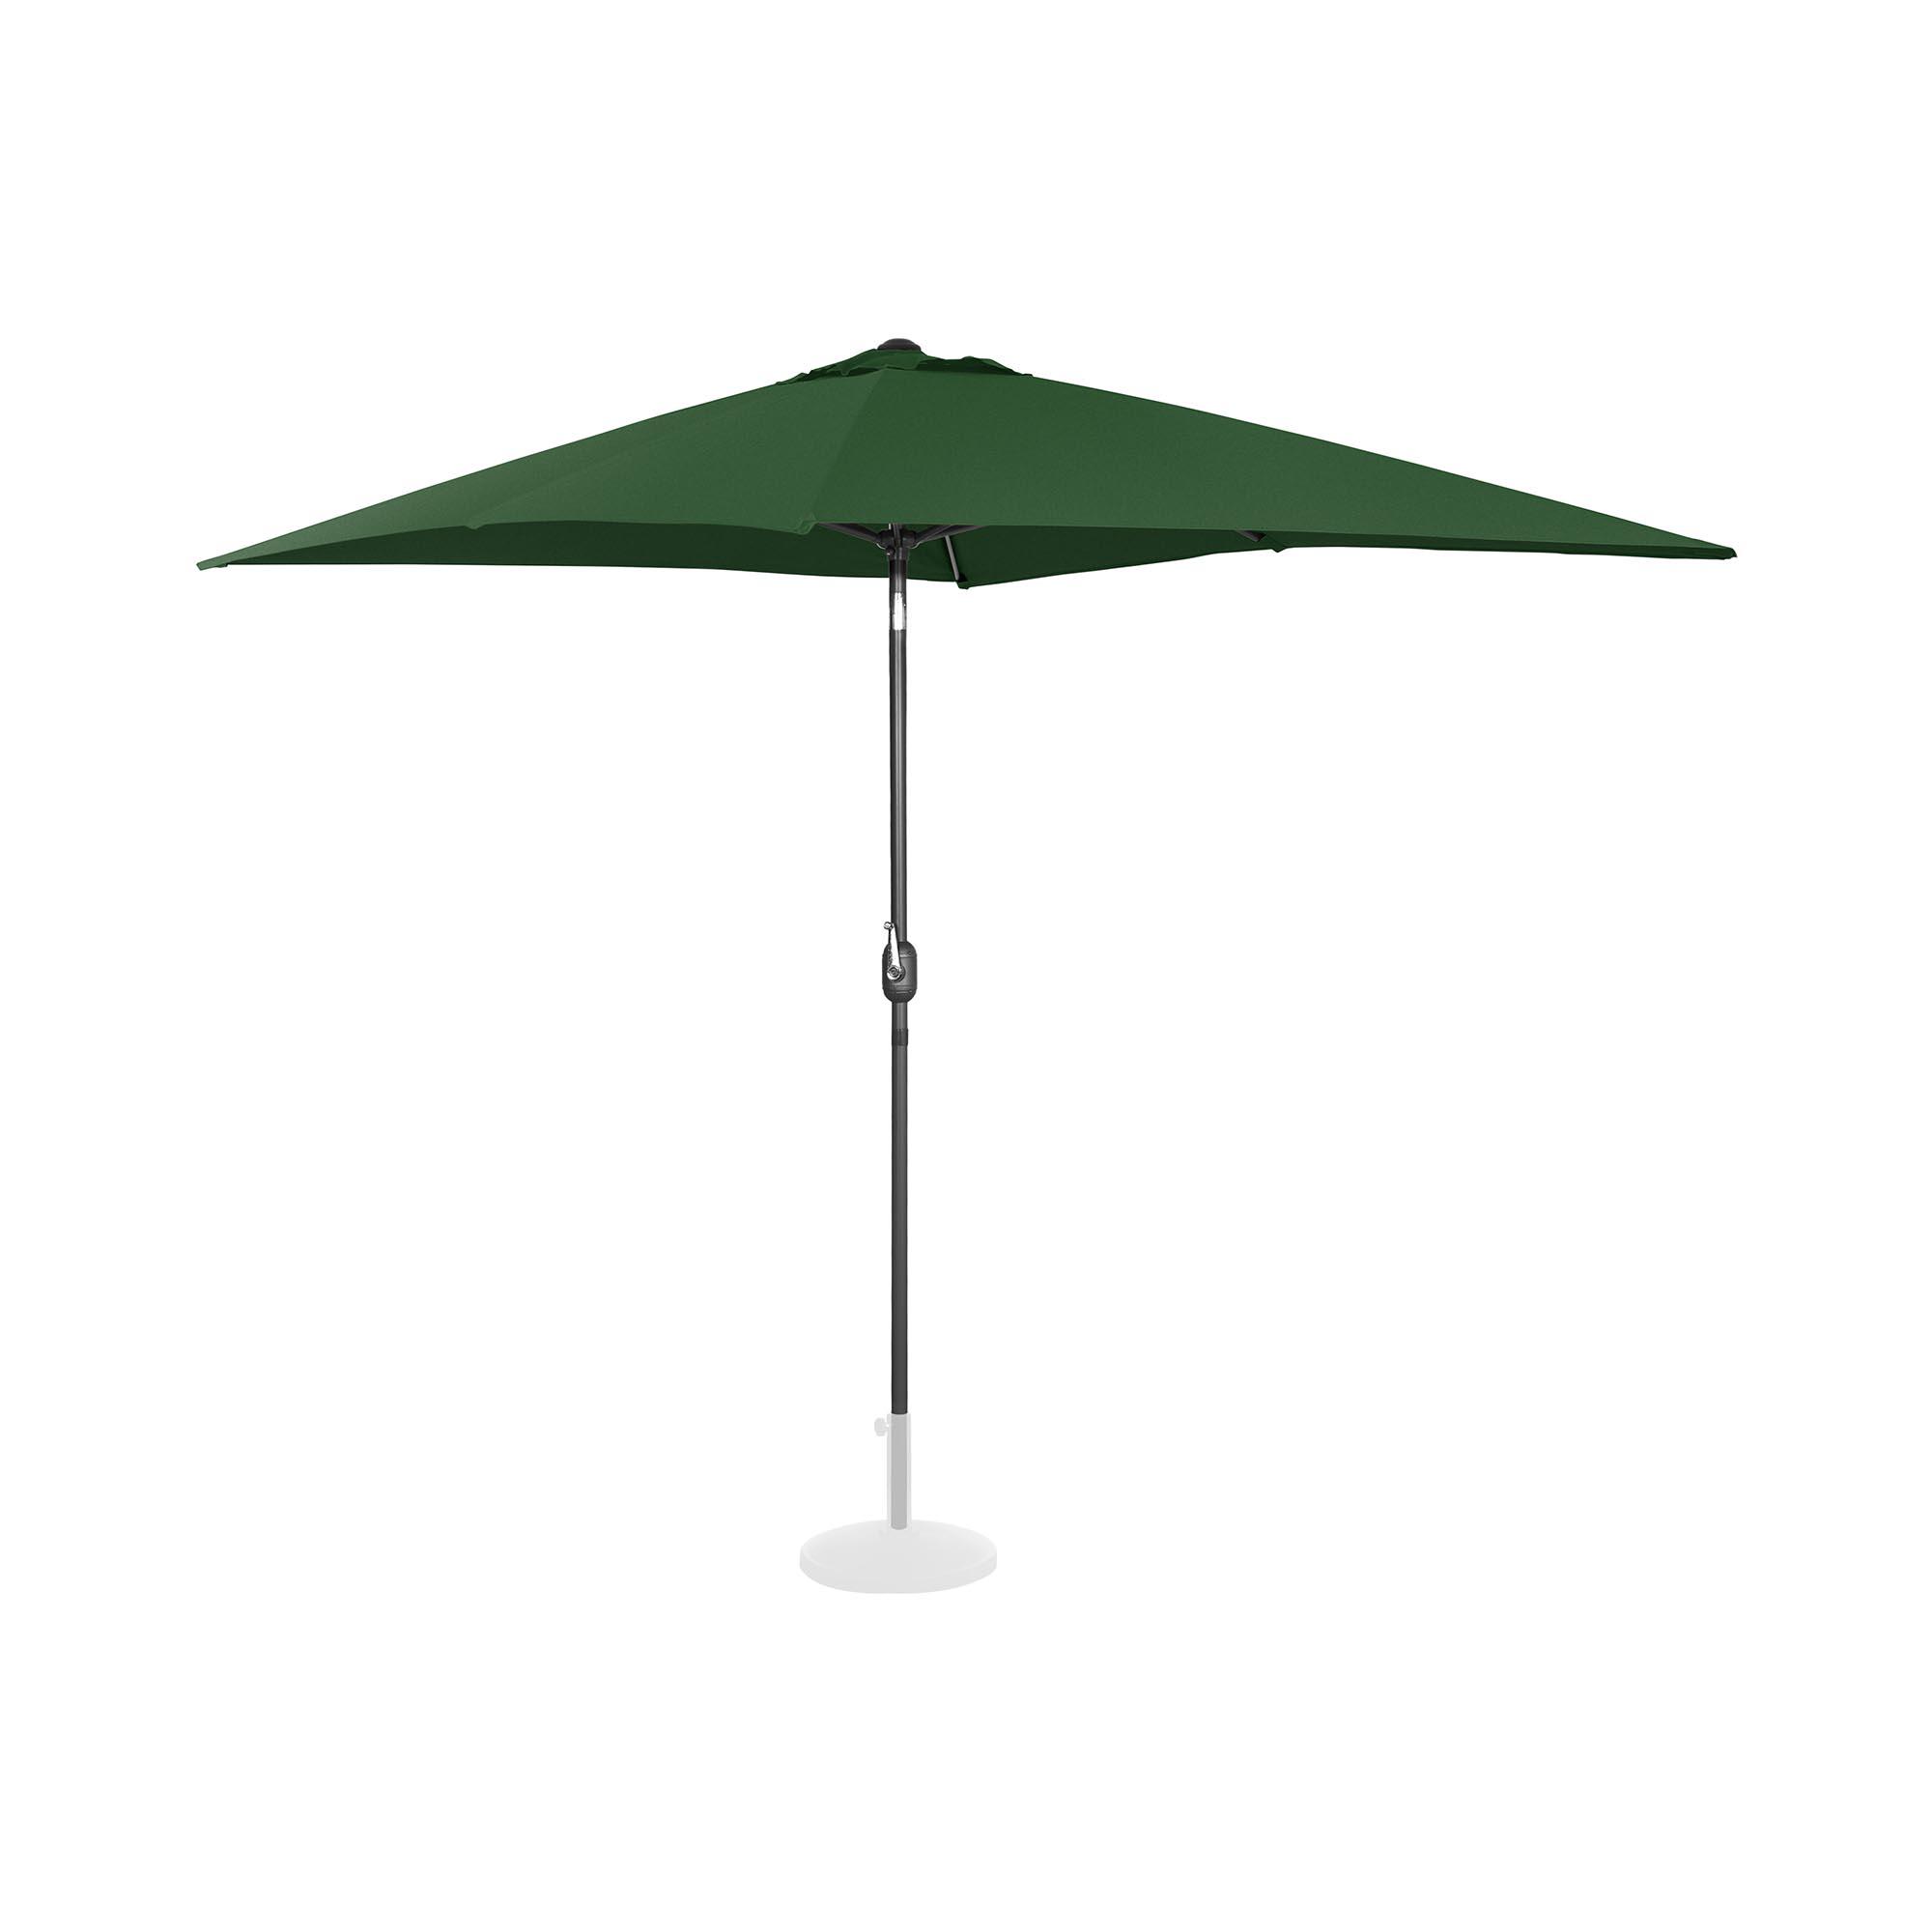 Uniprodo Sonnenschirm groß - grün - rechteckig - 200 x 300 cm - neigbar UNI_UMBRELLA_TSQ2030GR